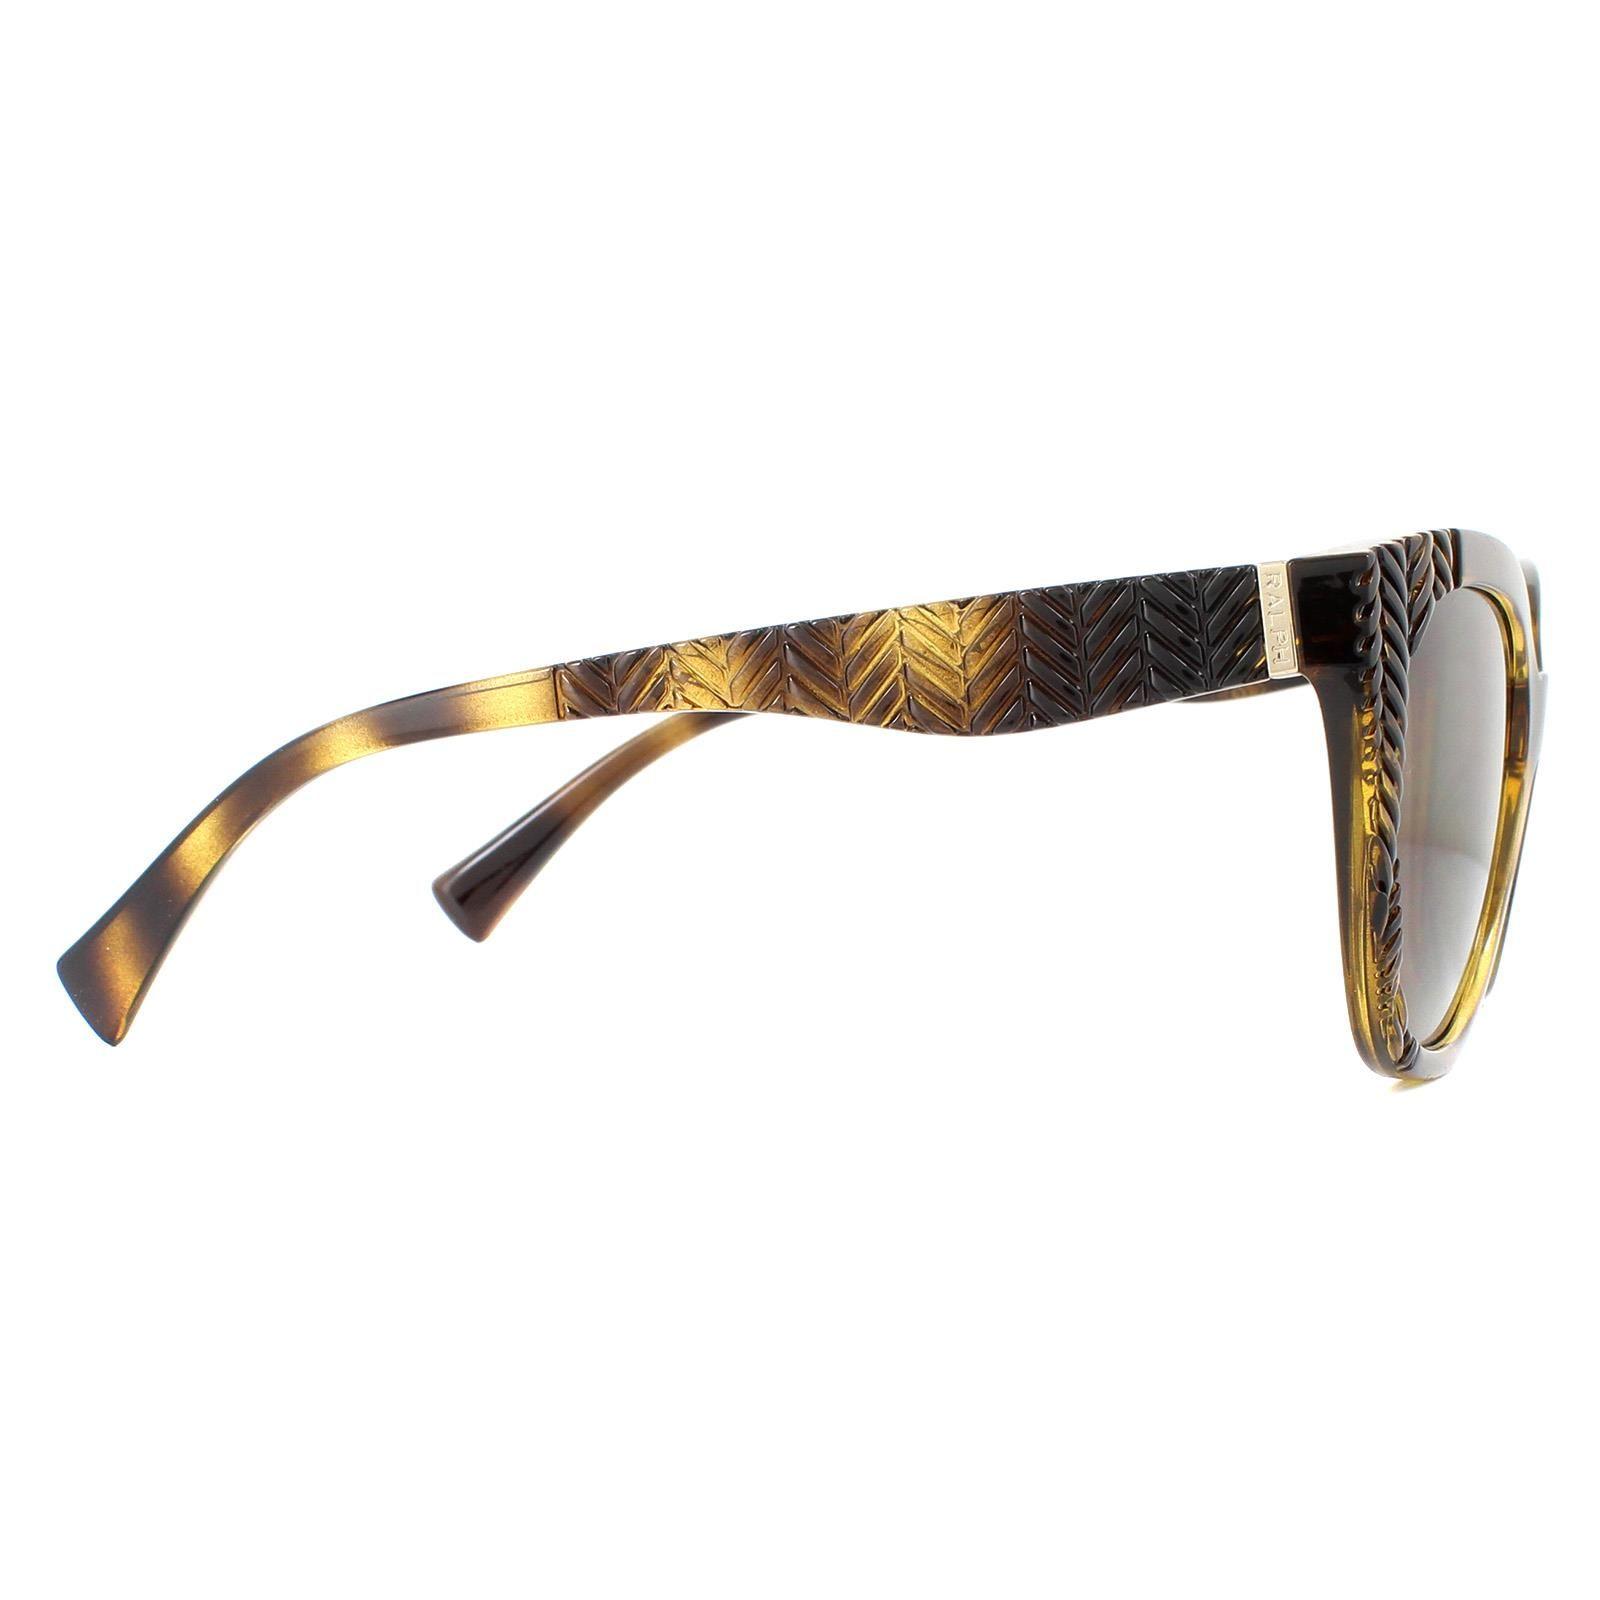 Ralph by Ralph Lauren Sunglasses RA5253 500373 Dark Havana Brown